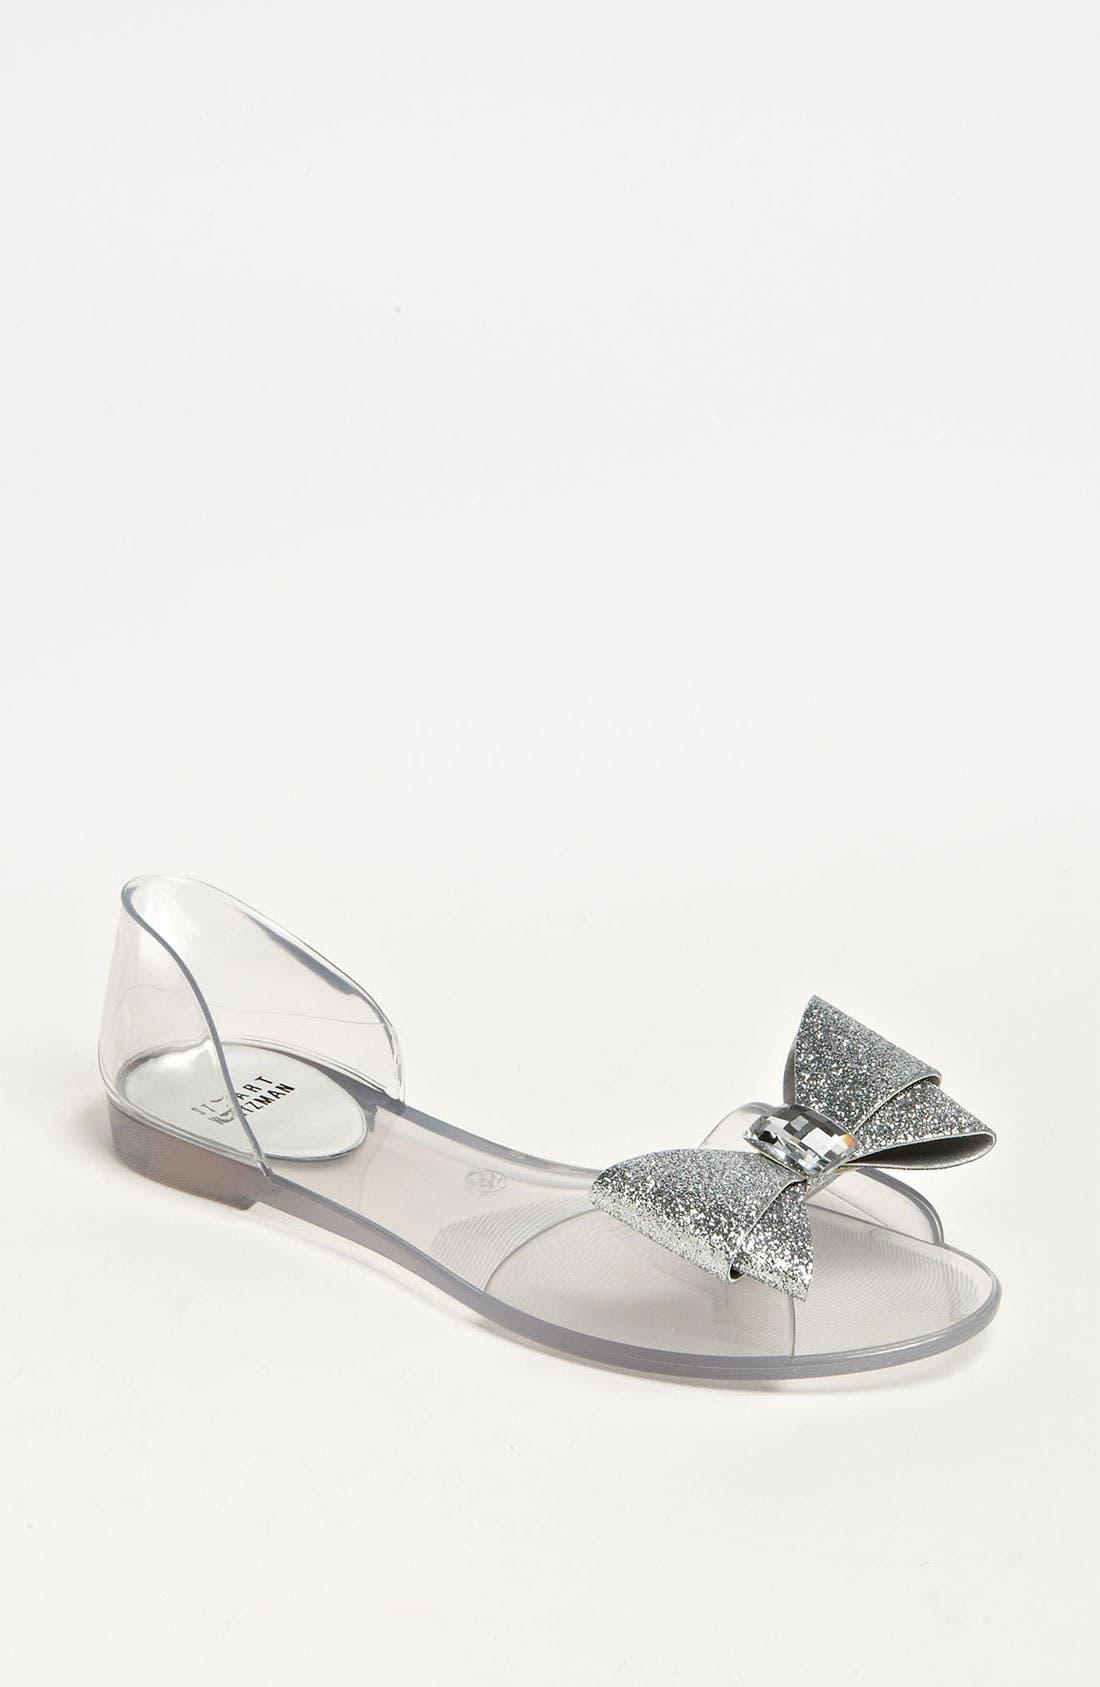 Main Image - Stuart Weitzman 'Gemini' Sandal